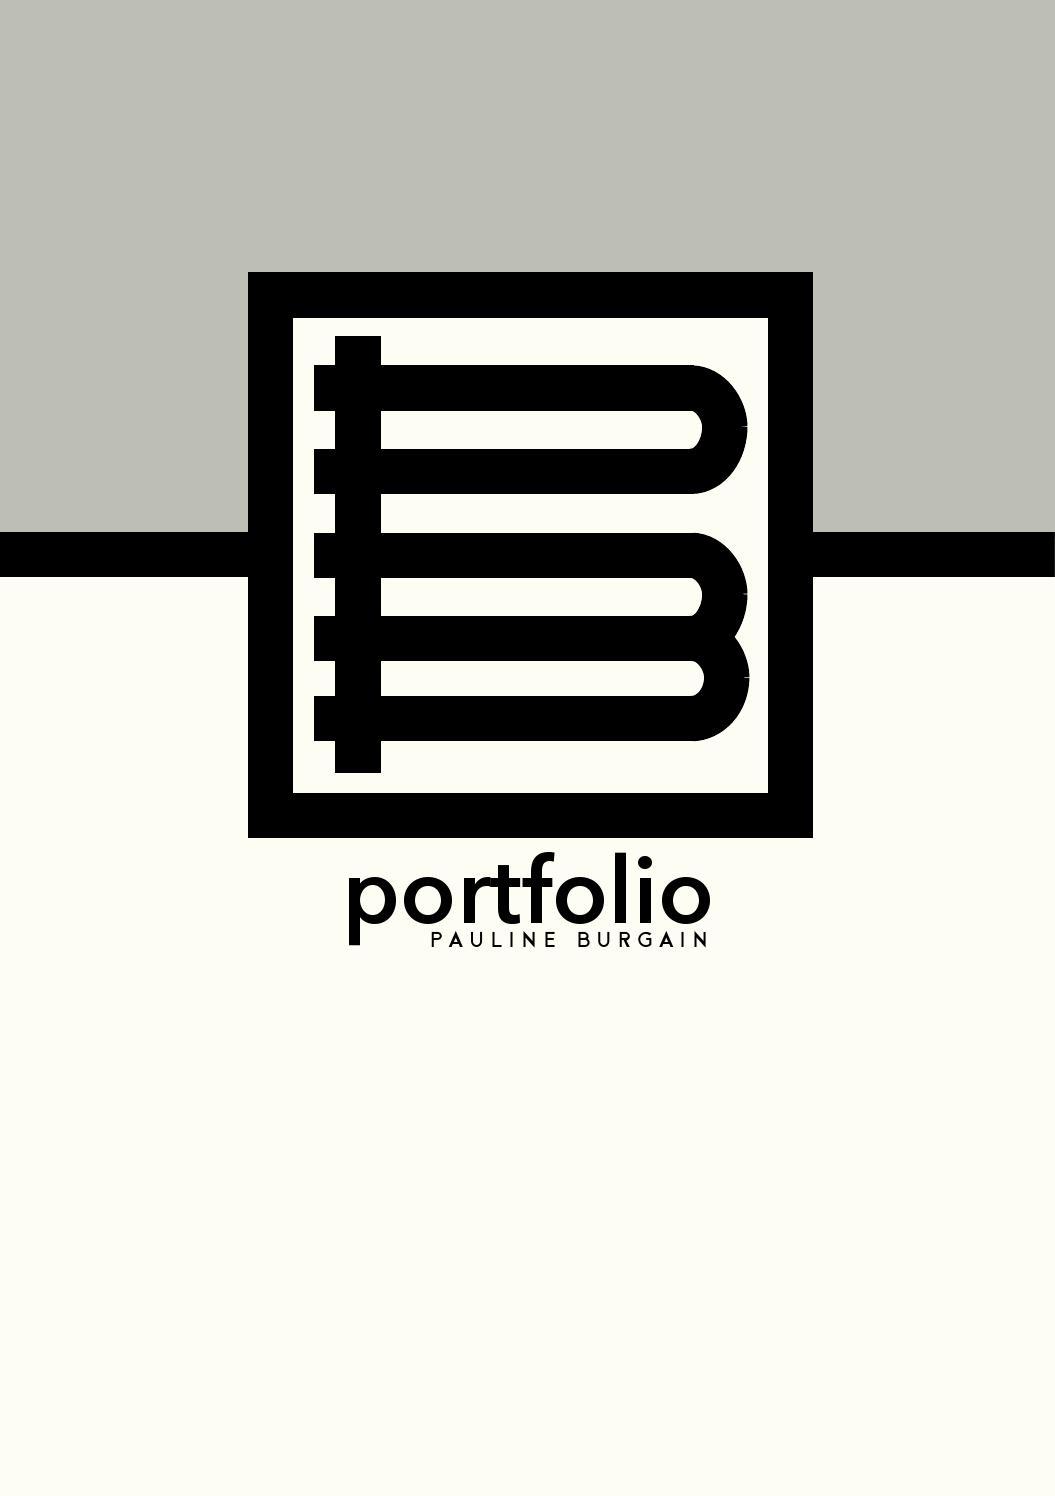 portfolio pauline burgain by pauline burgain